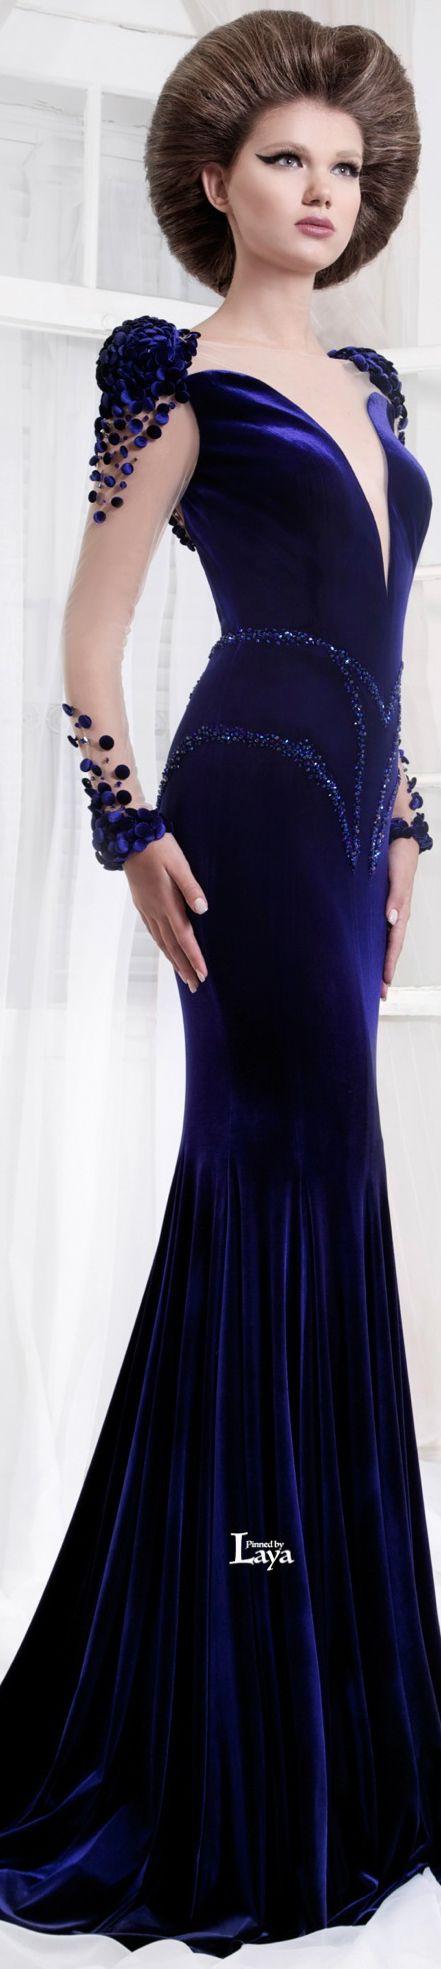 Tarek sinno fw couture jaglady burlesquedrag ideas